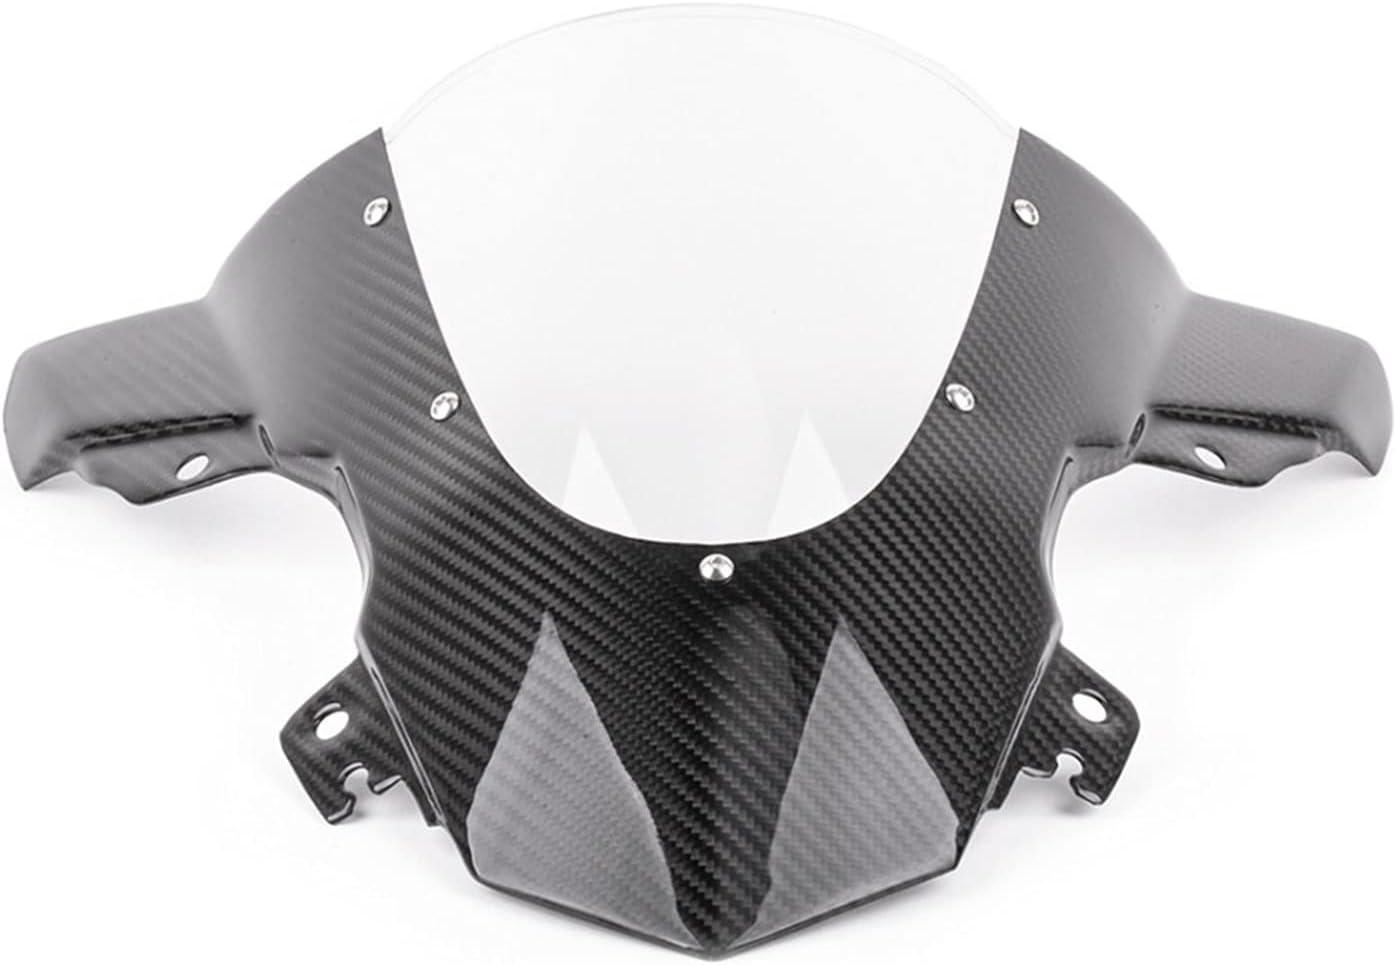 JBSM Real Carbon Fiber Motorcycle Deflectors Windshi Wind Screen High Virginia Beach Mall quality